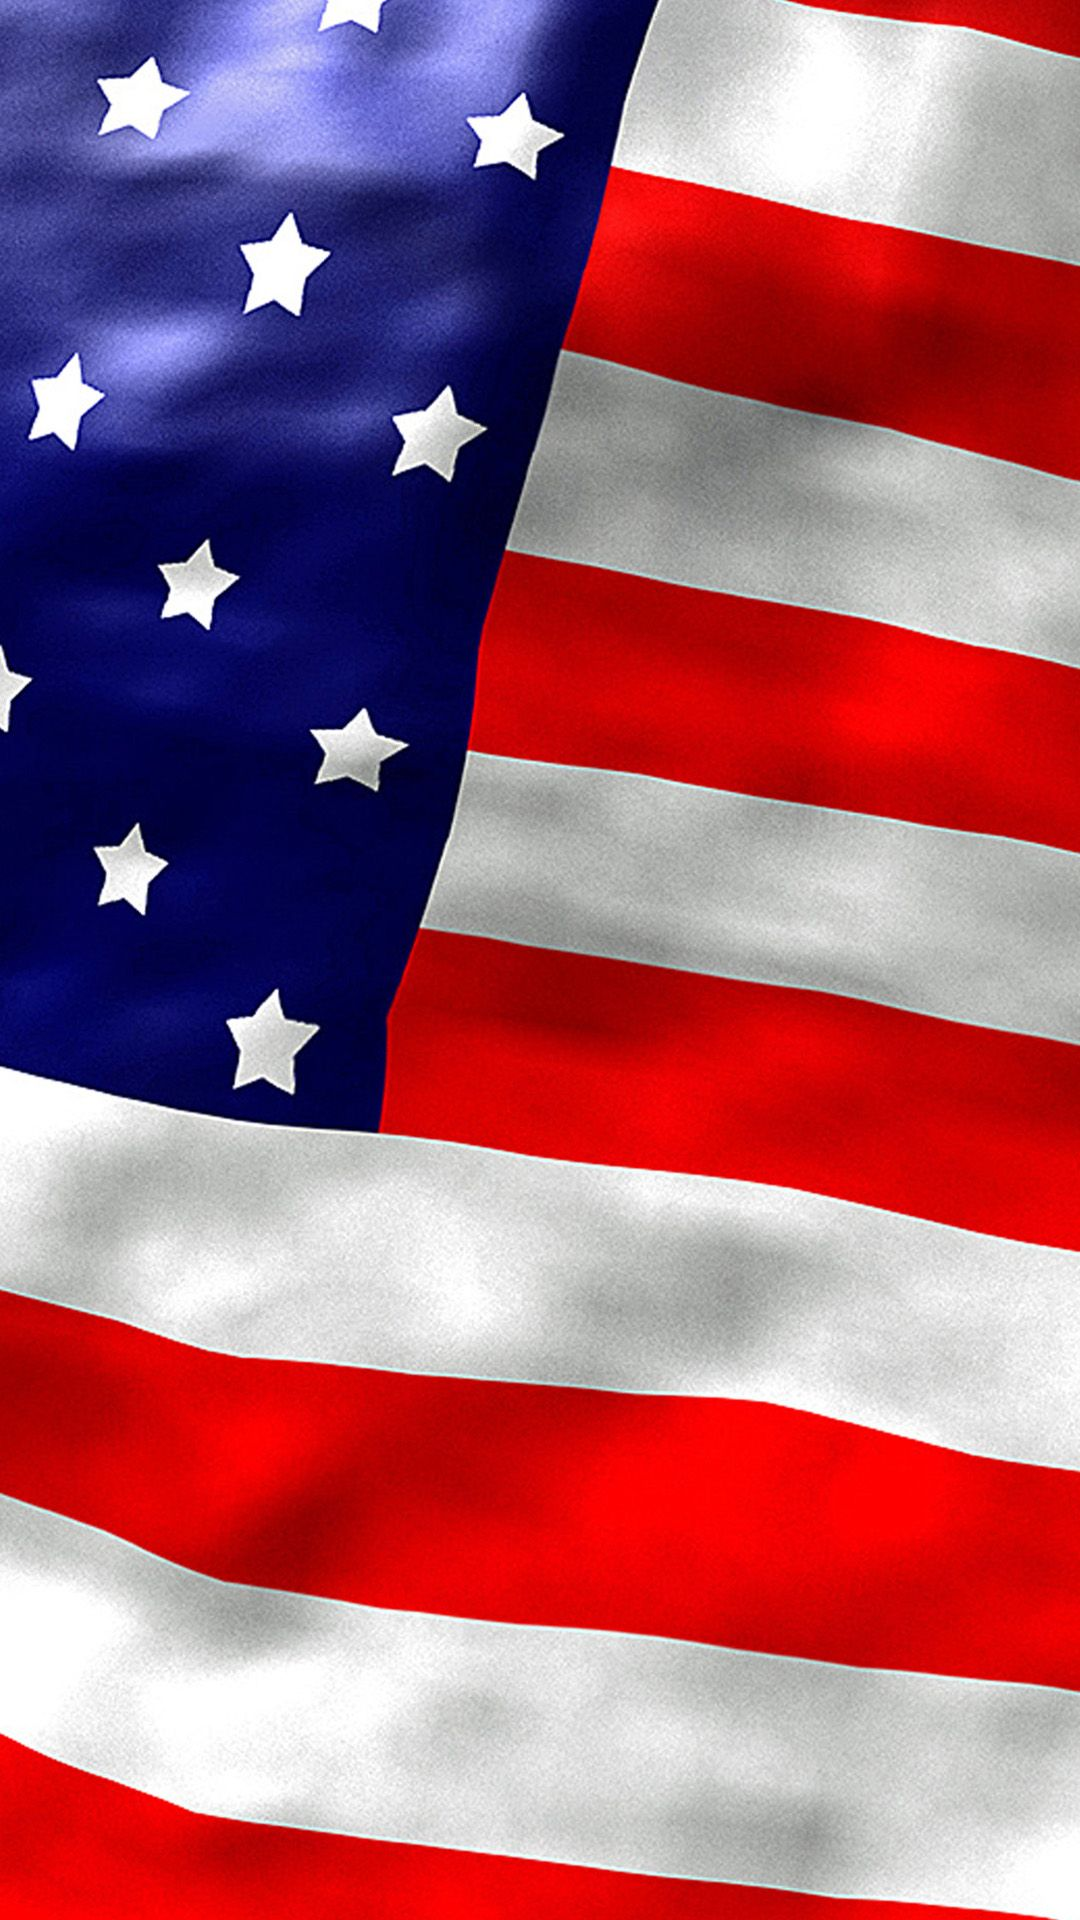 American Flag 2 Wallpapers American flag wallpaper